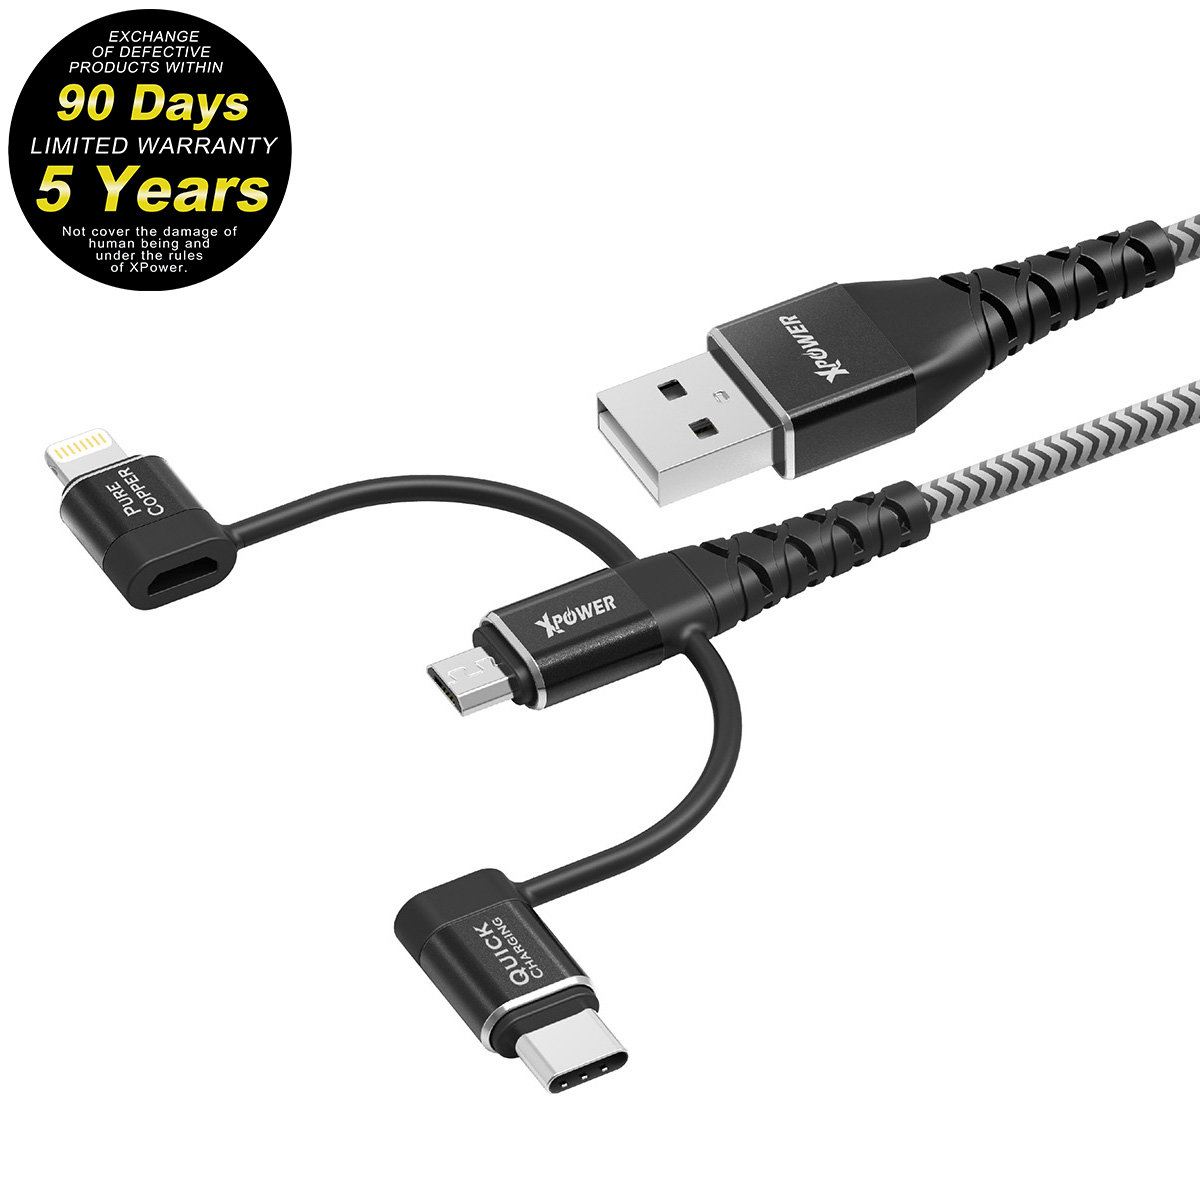 0.2m K3強韌3合1高速傳輸充電線[Type-C + Micro USB + Lightning] - 黑色